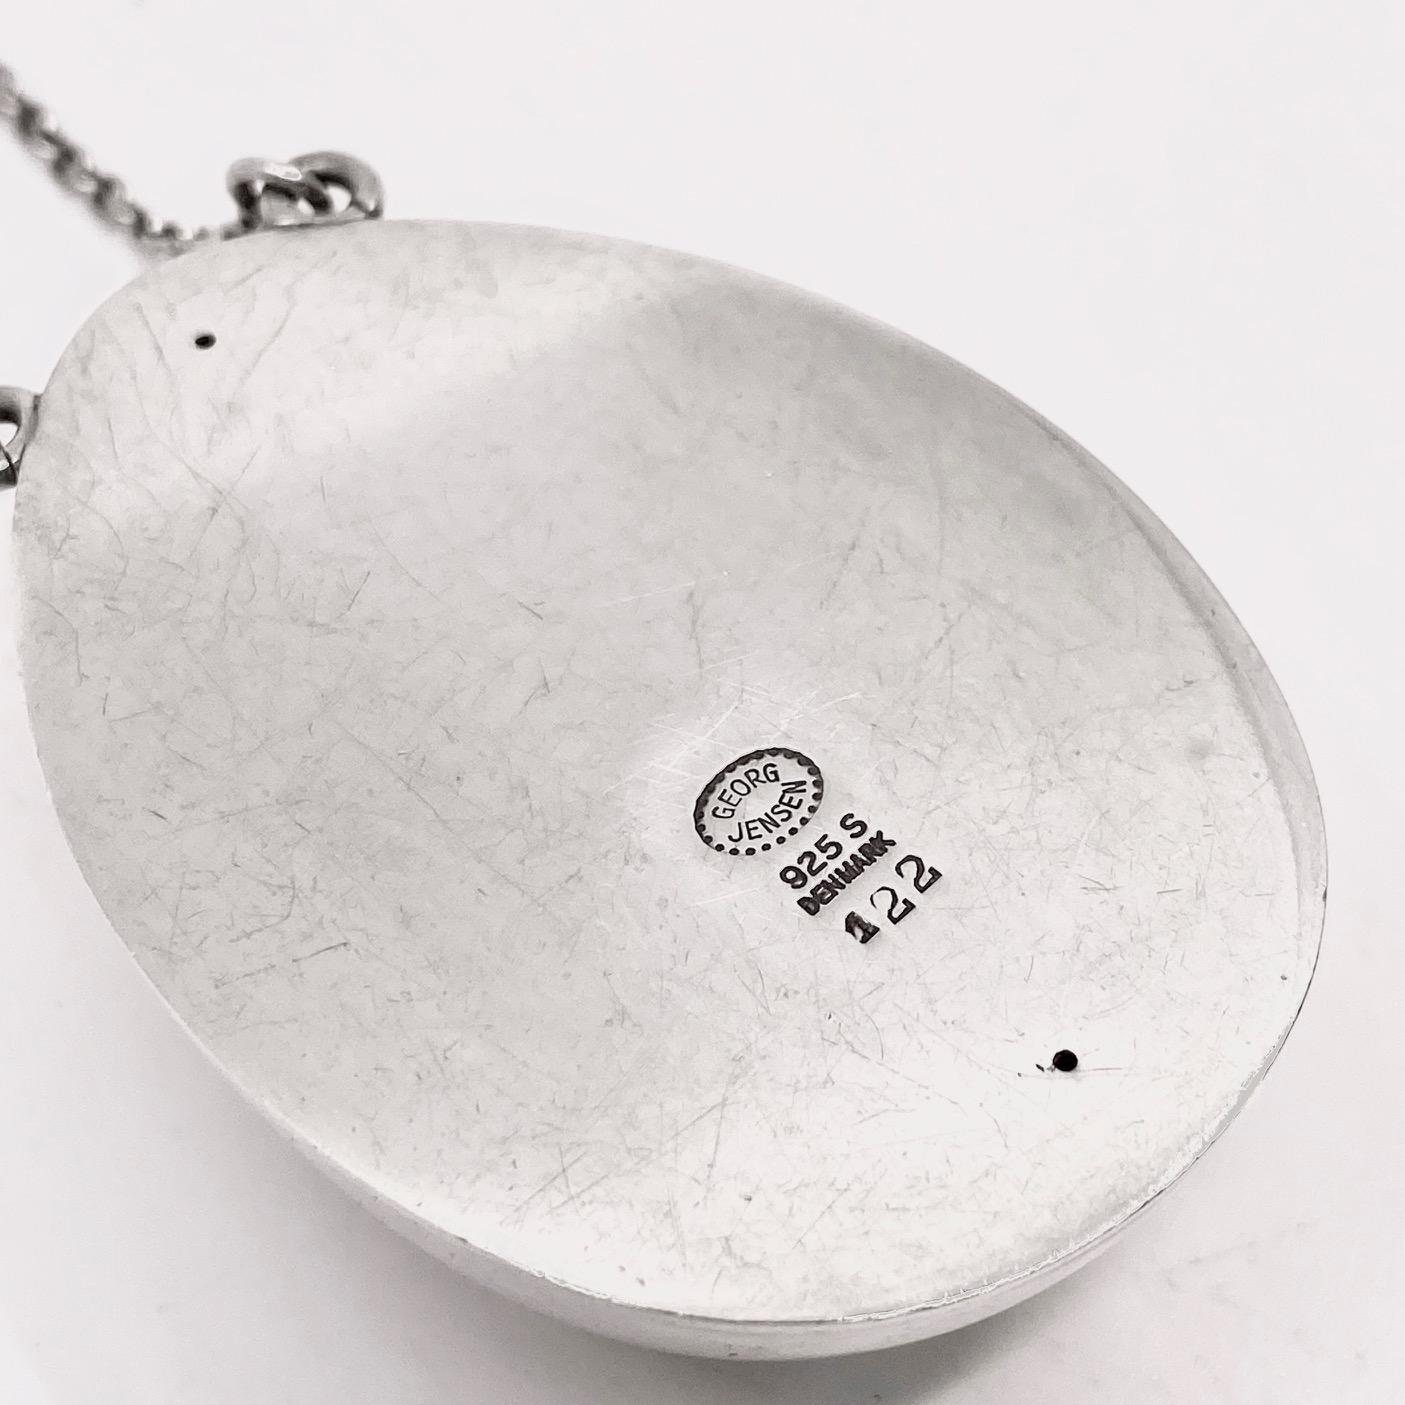 32x26mm 2 Silver Pendant Antique Silver Plated Pendants G11082